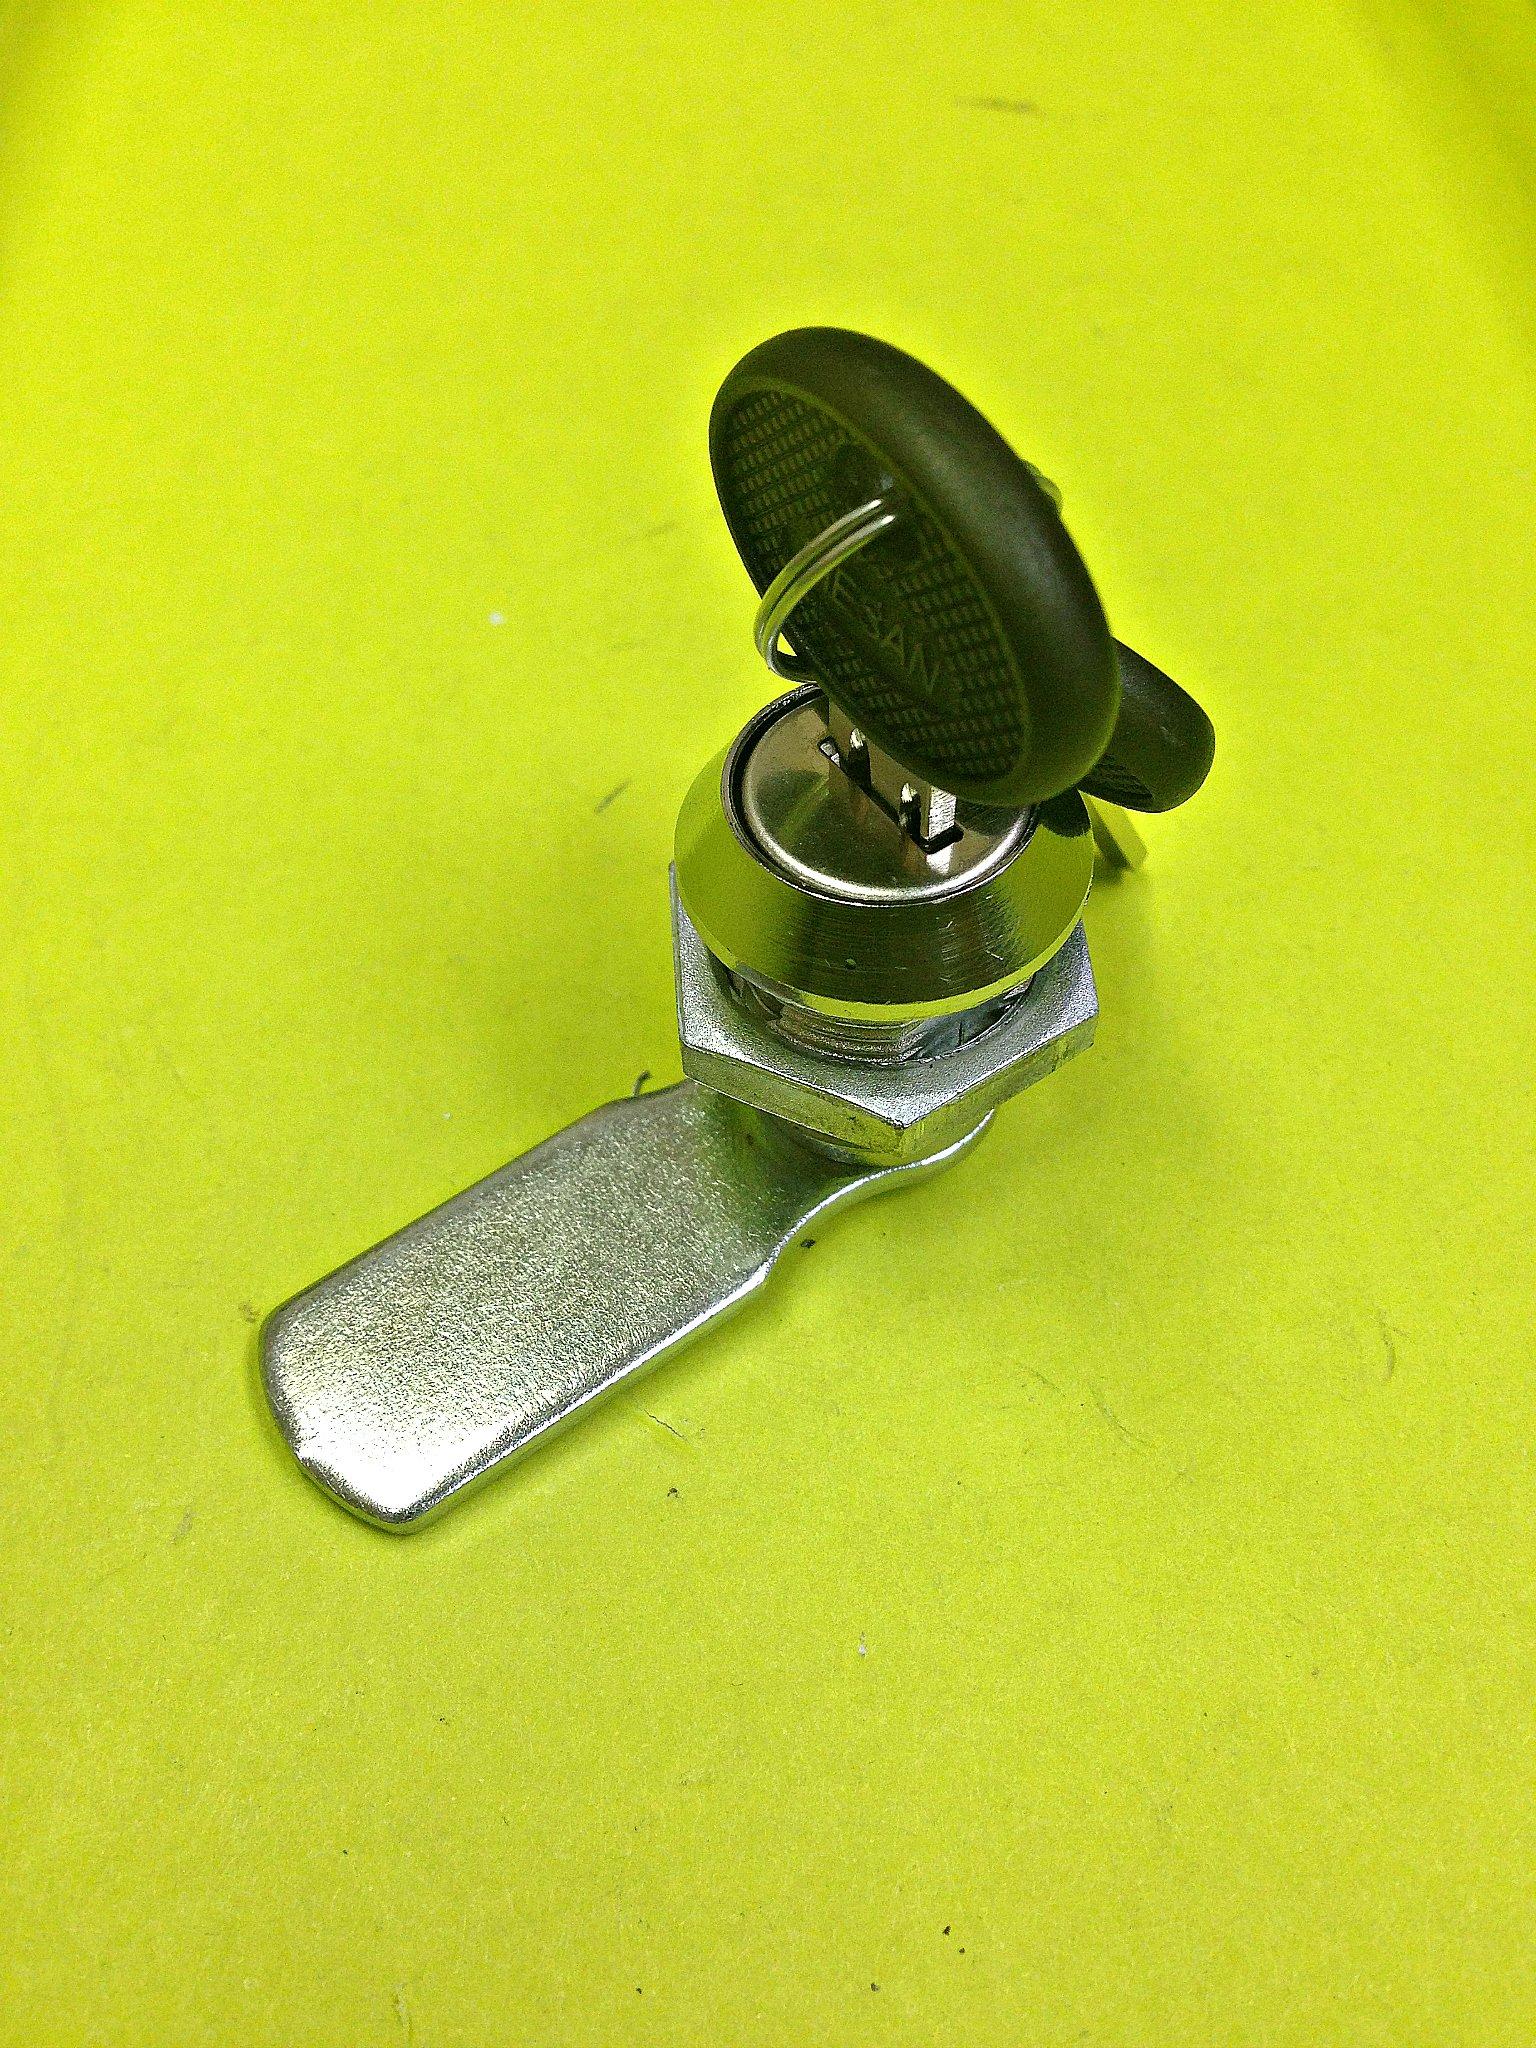 Lot of 4 Cam Lock File Cabinet Mailbox Desk Drawer Cupboard Locker + 2 Keys 90° Rotation 050.20.03.50